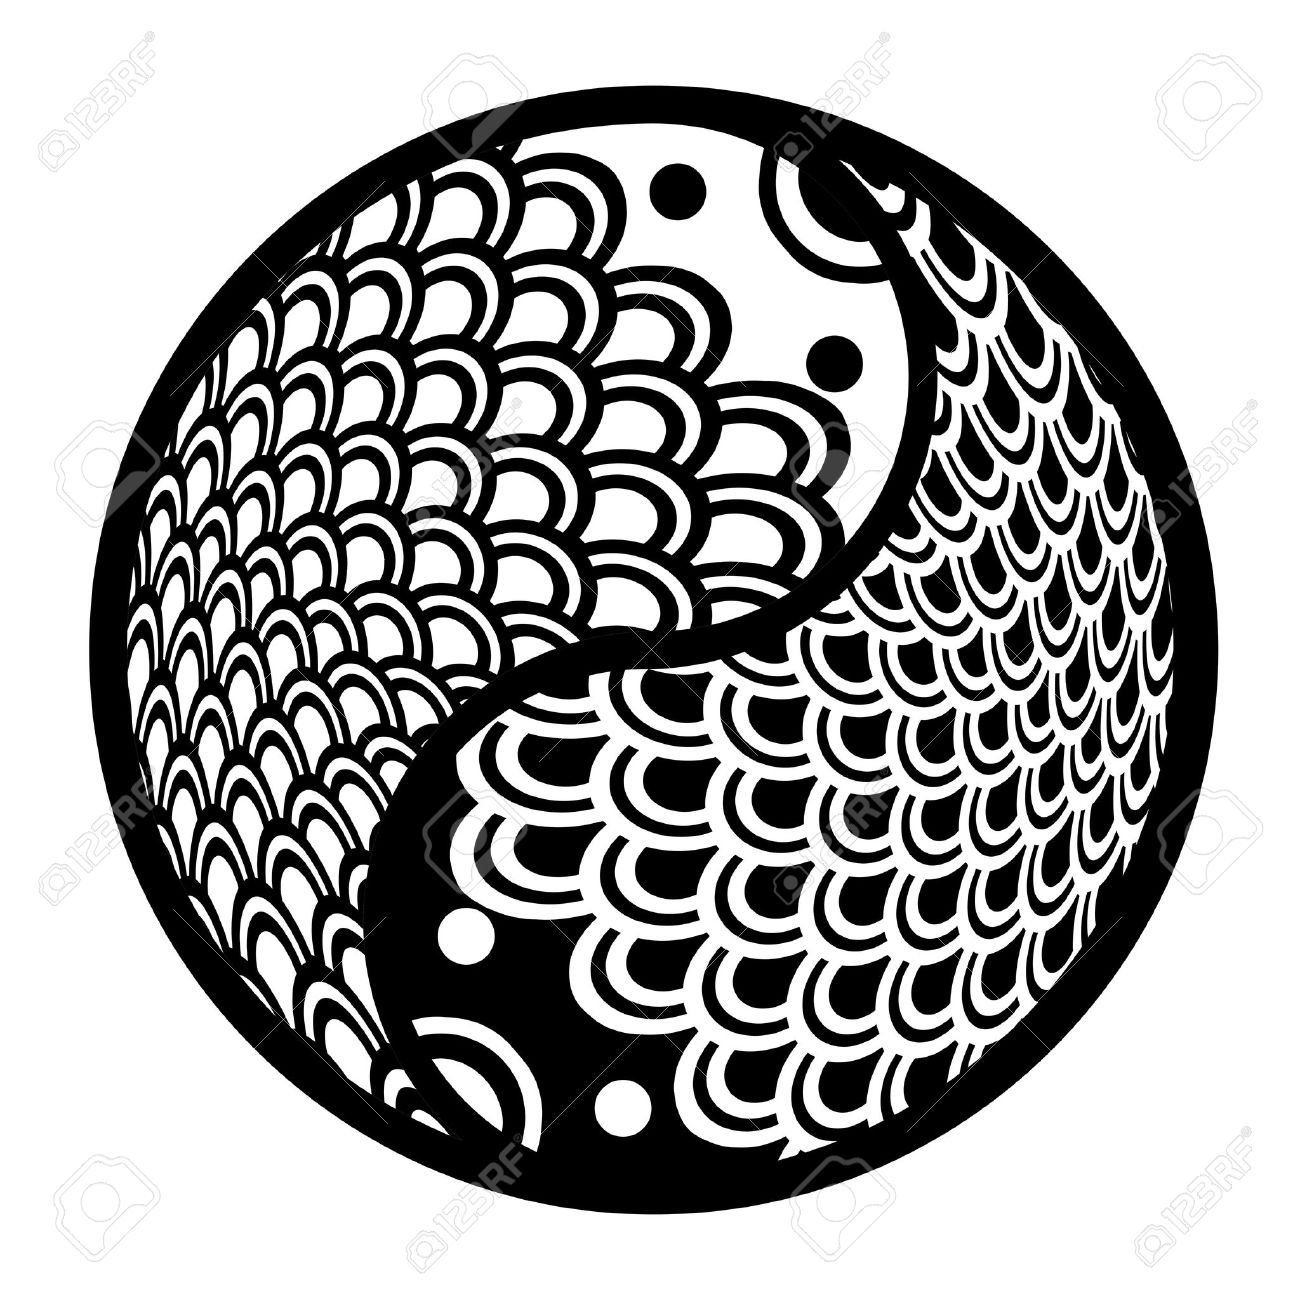 chinese pair of fish in yin yang eternity circle illustration